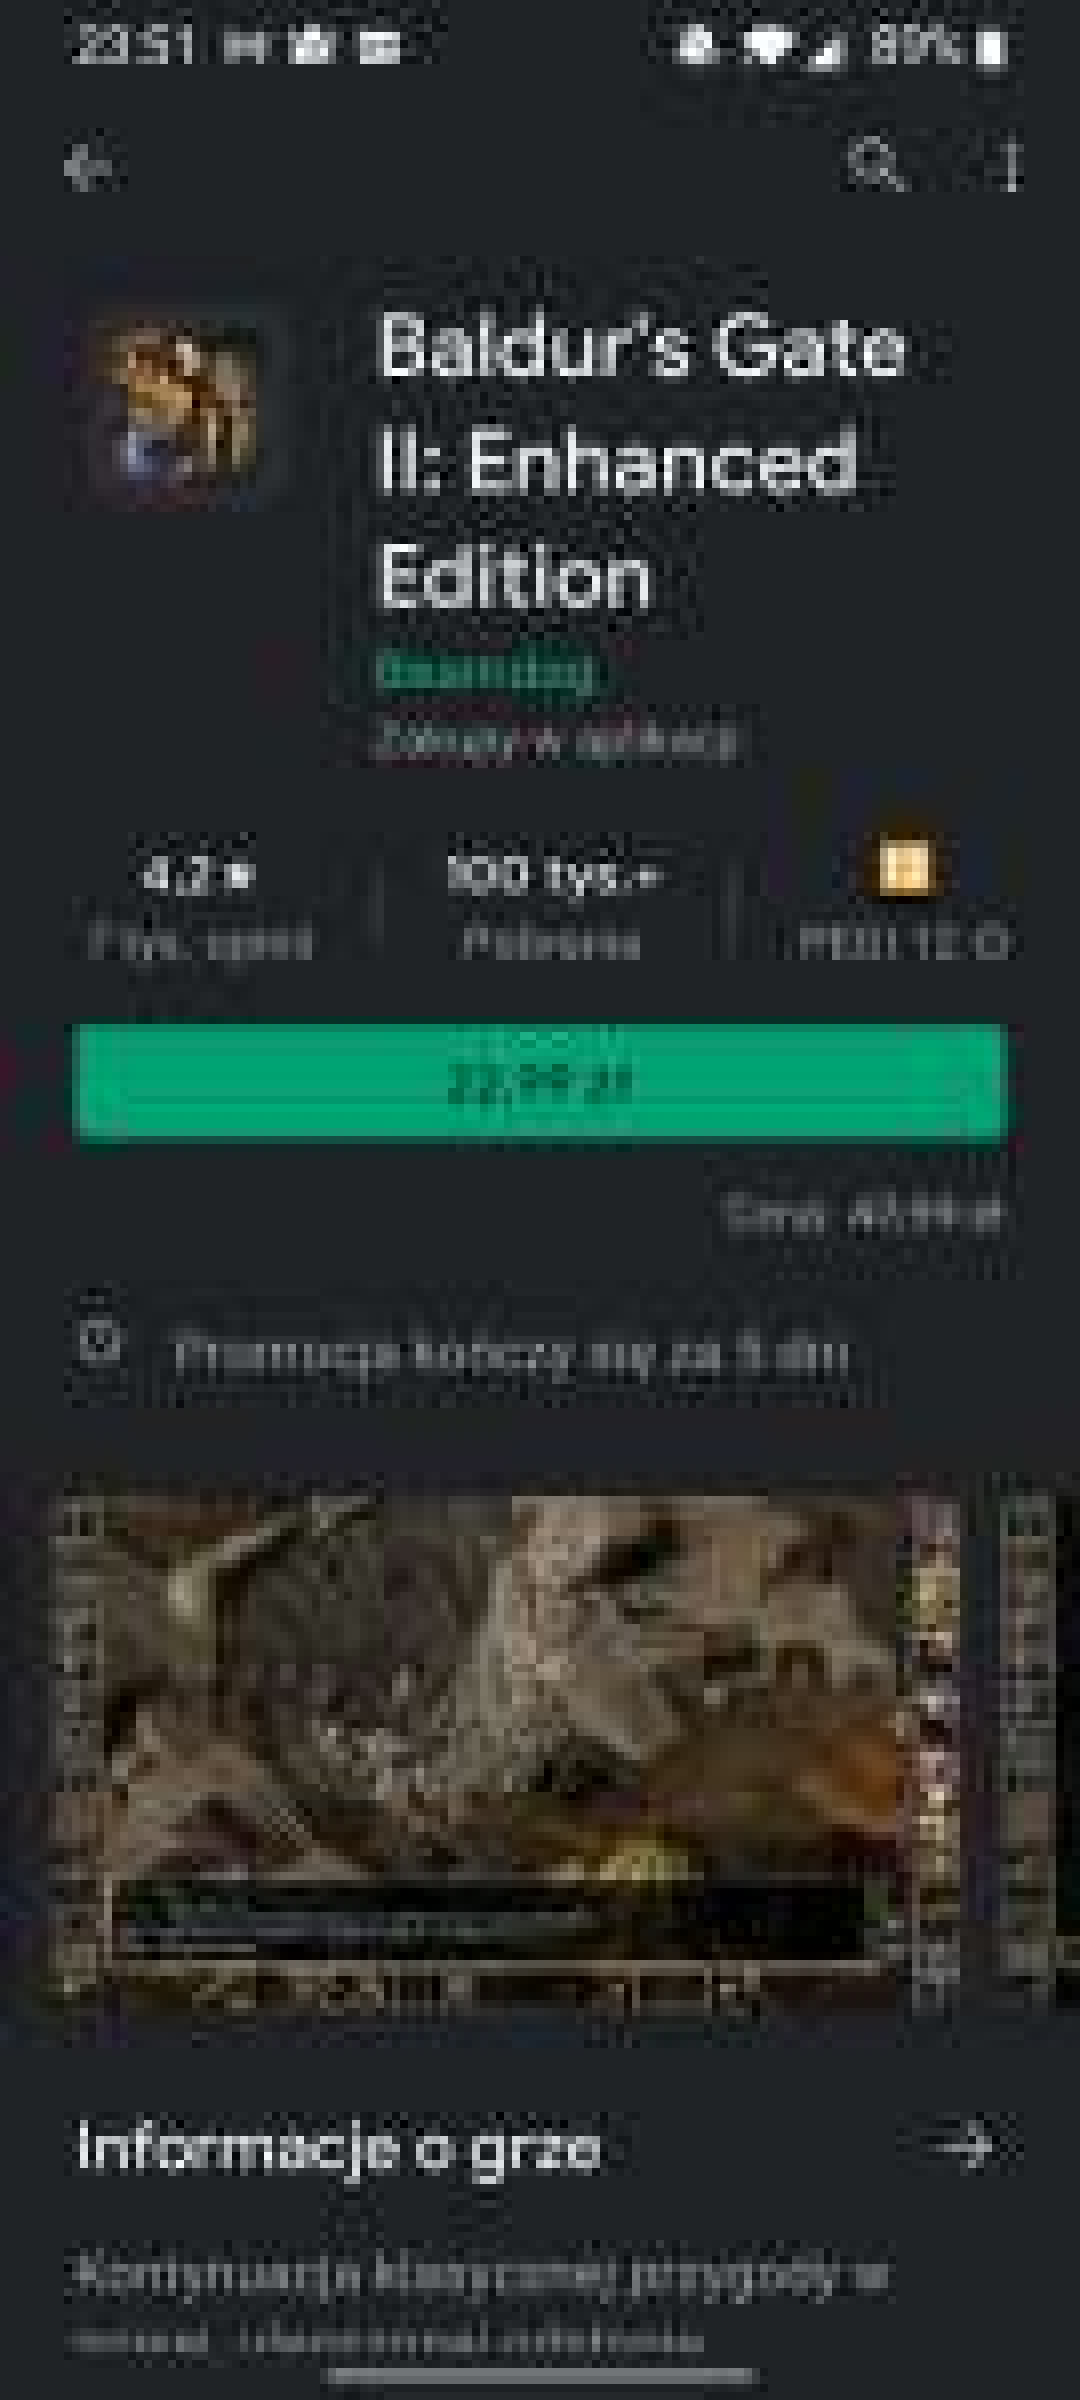 Baldur's Gate 2 n androida w obniżonej cenie.